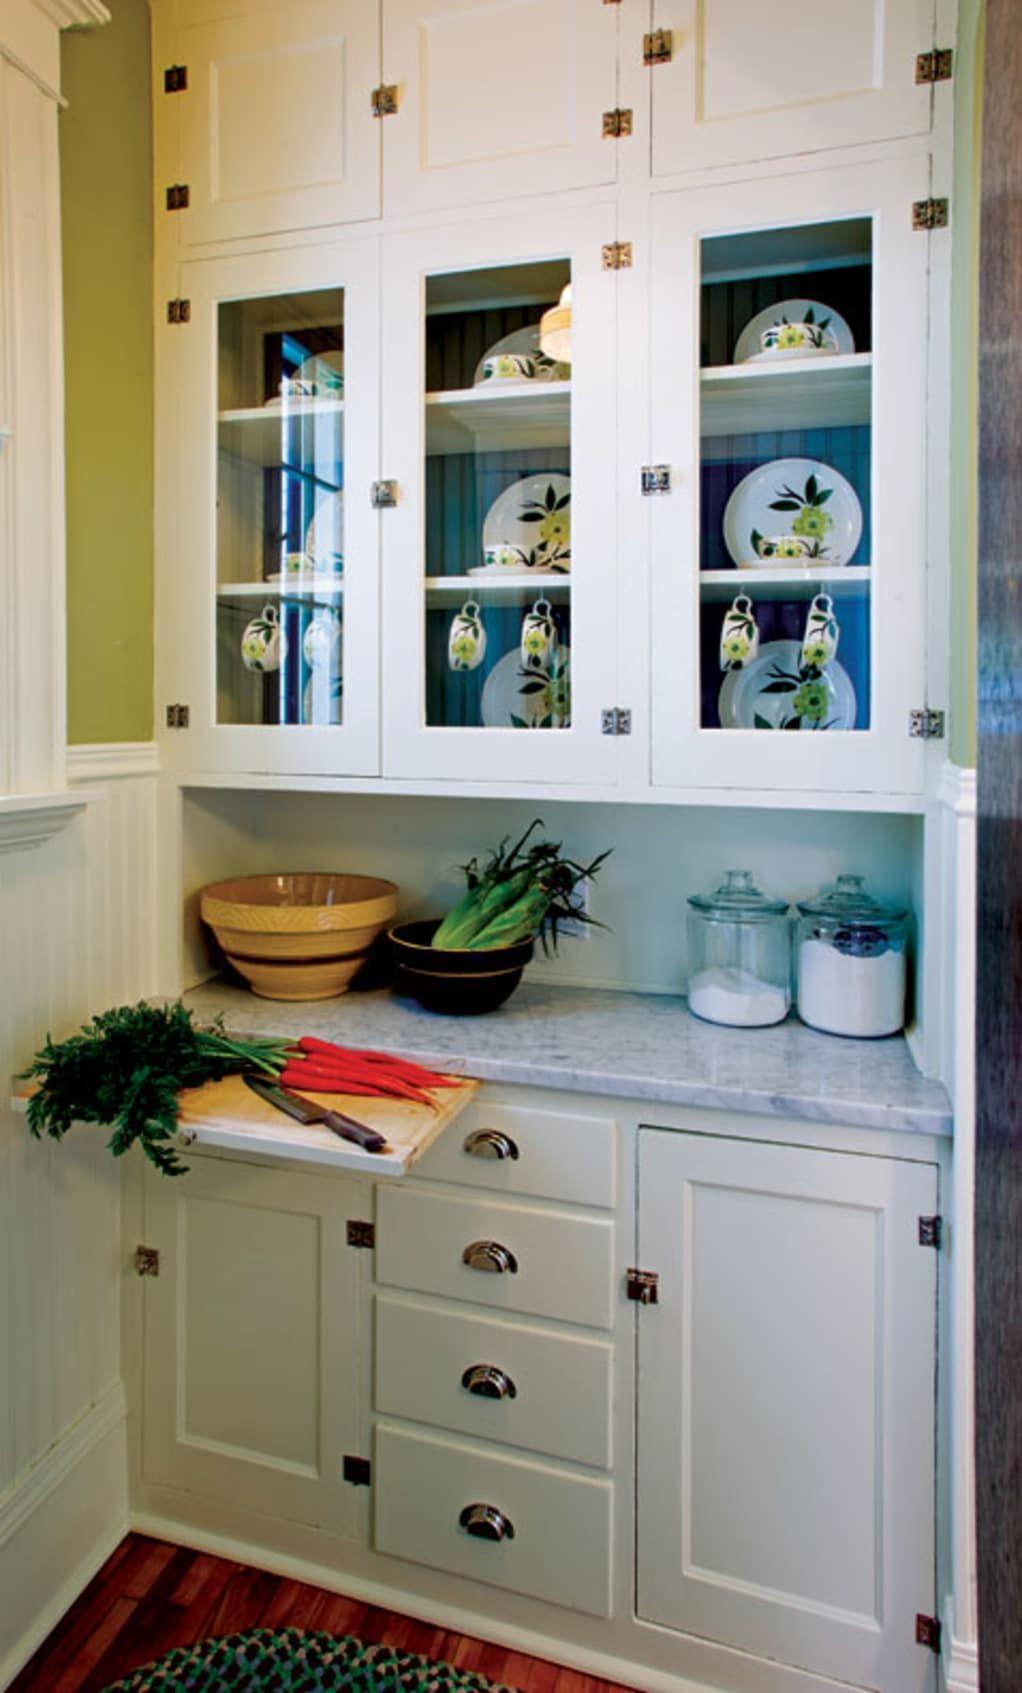 Sunny 1940s Inspired Kitchen Old House Journal Magazine Kitchen Remodel Cost Kitchen Remodel Layout Kitchen Restoration